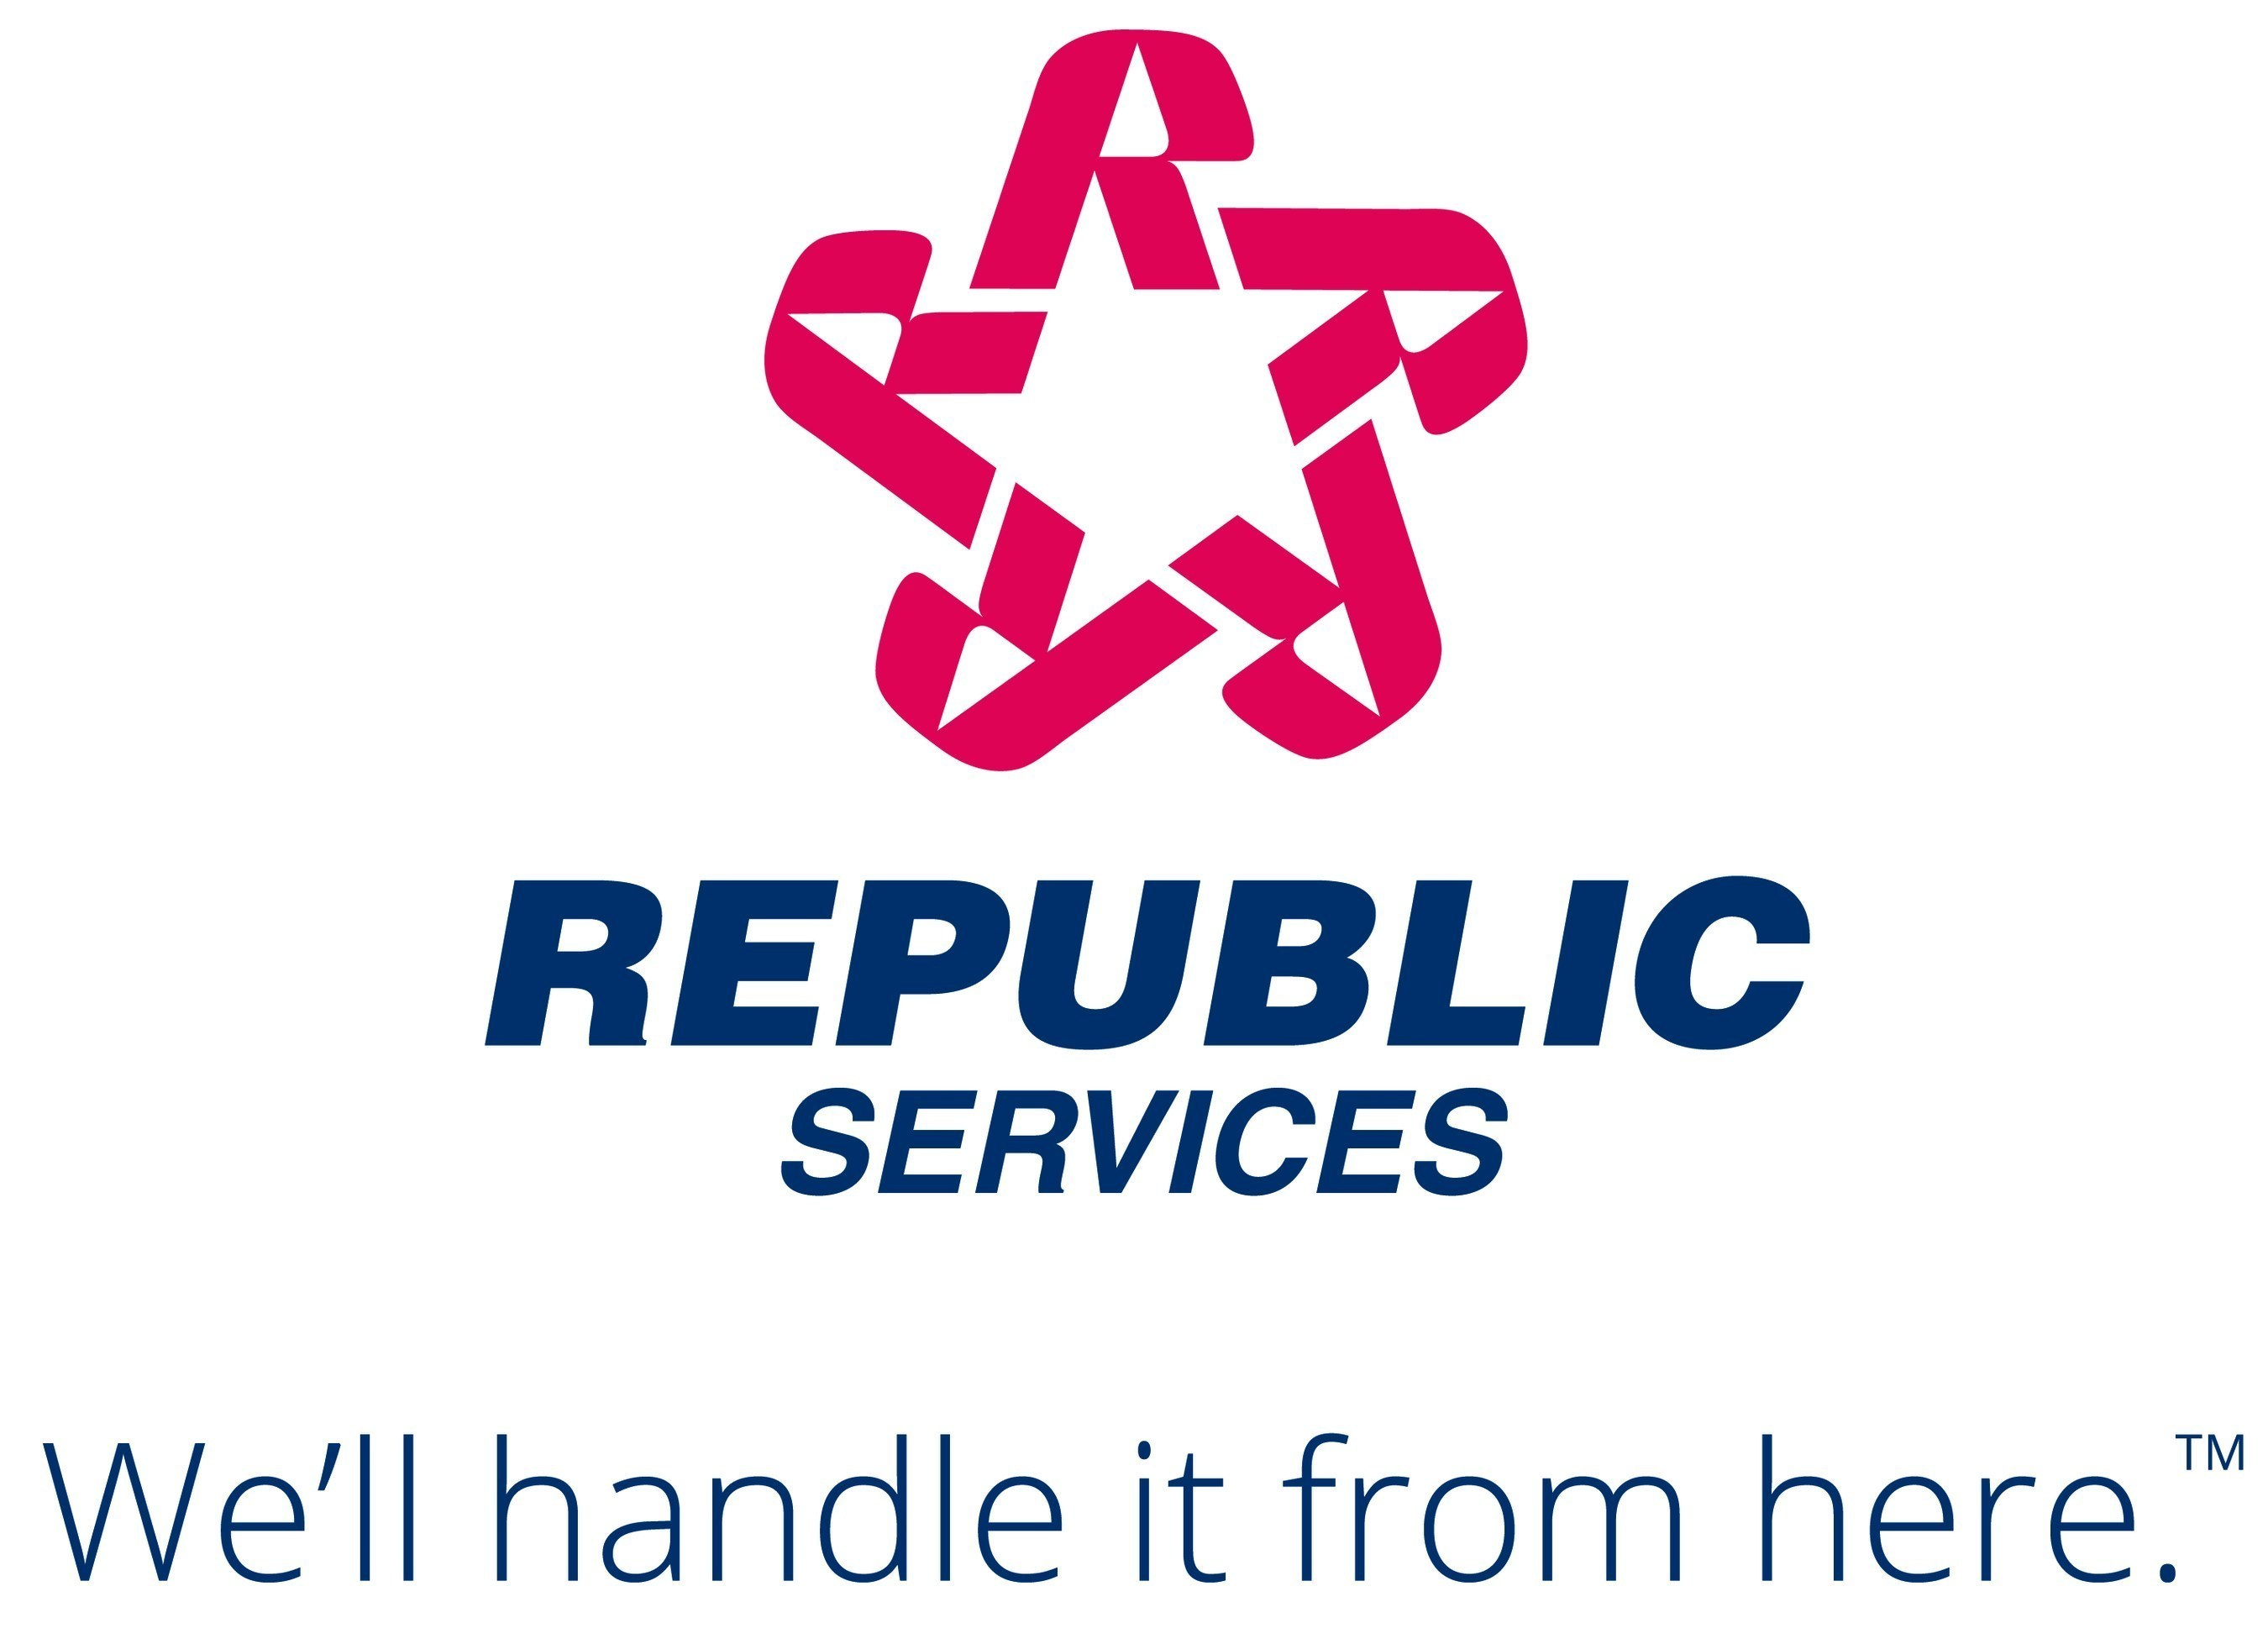 We'll handle it from here. (PRNewsFoto/Republic Services, Inc.) (PRNewsFoto/Republic Services, Inc.) (PRNewsFoto/Republic Services, Inc.)